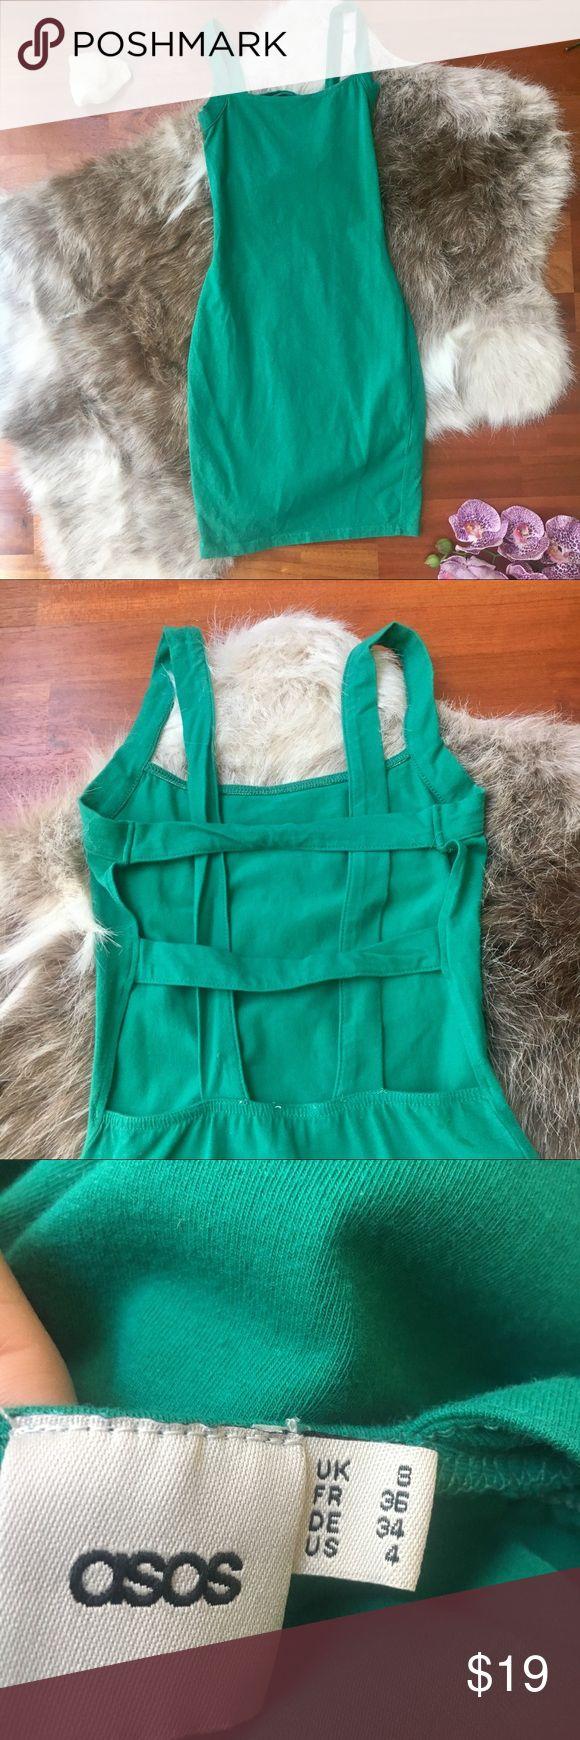 ASOS emerald green bodycon dress - NWOT - 4 Super cute strappy back.   Never worn! ASOS Dresses Mini